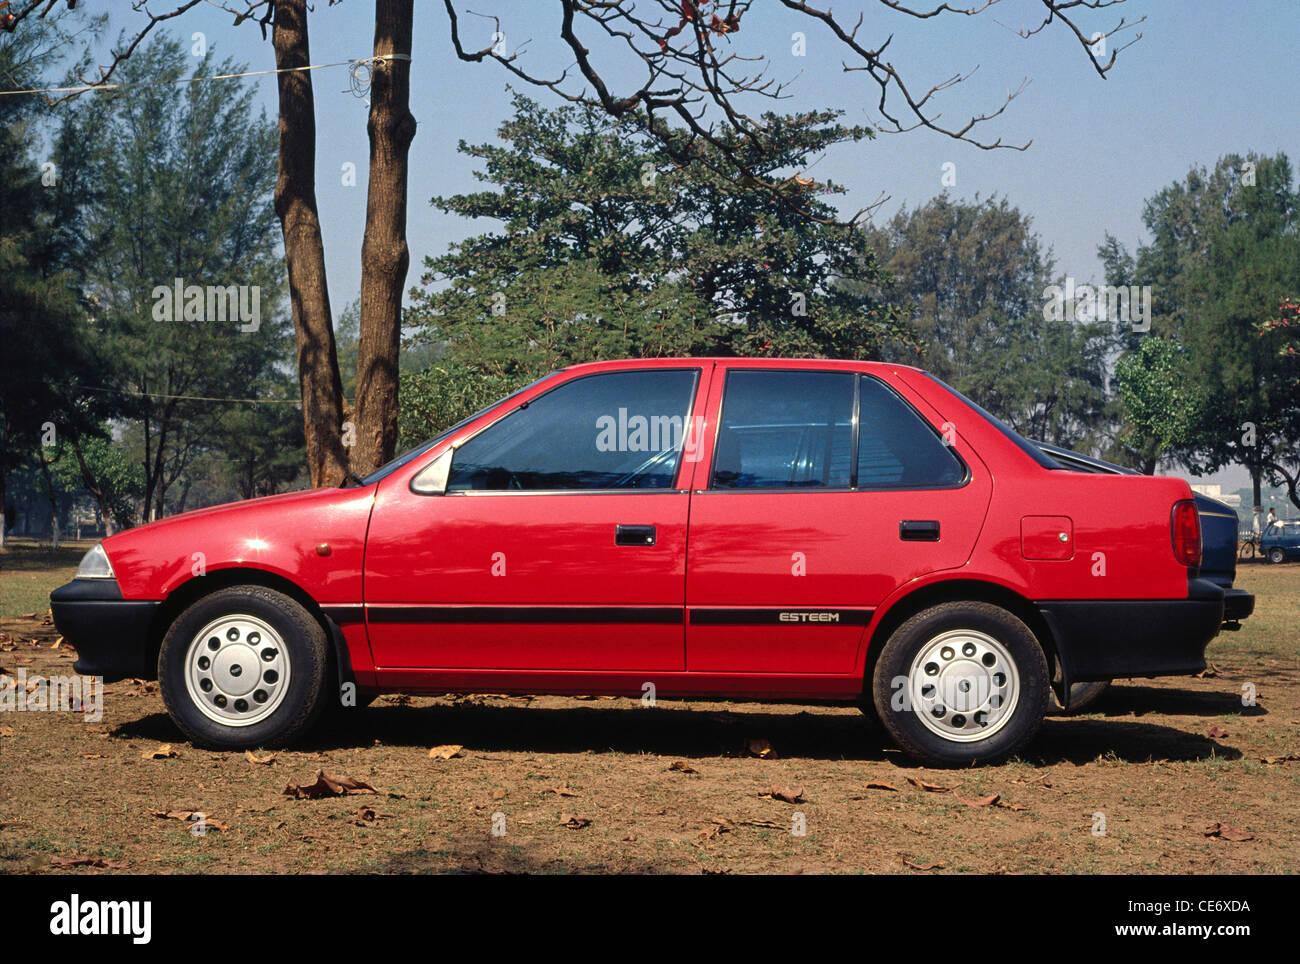 Price Maruti 1000 Used Cars - Mitula Cars